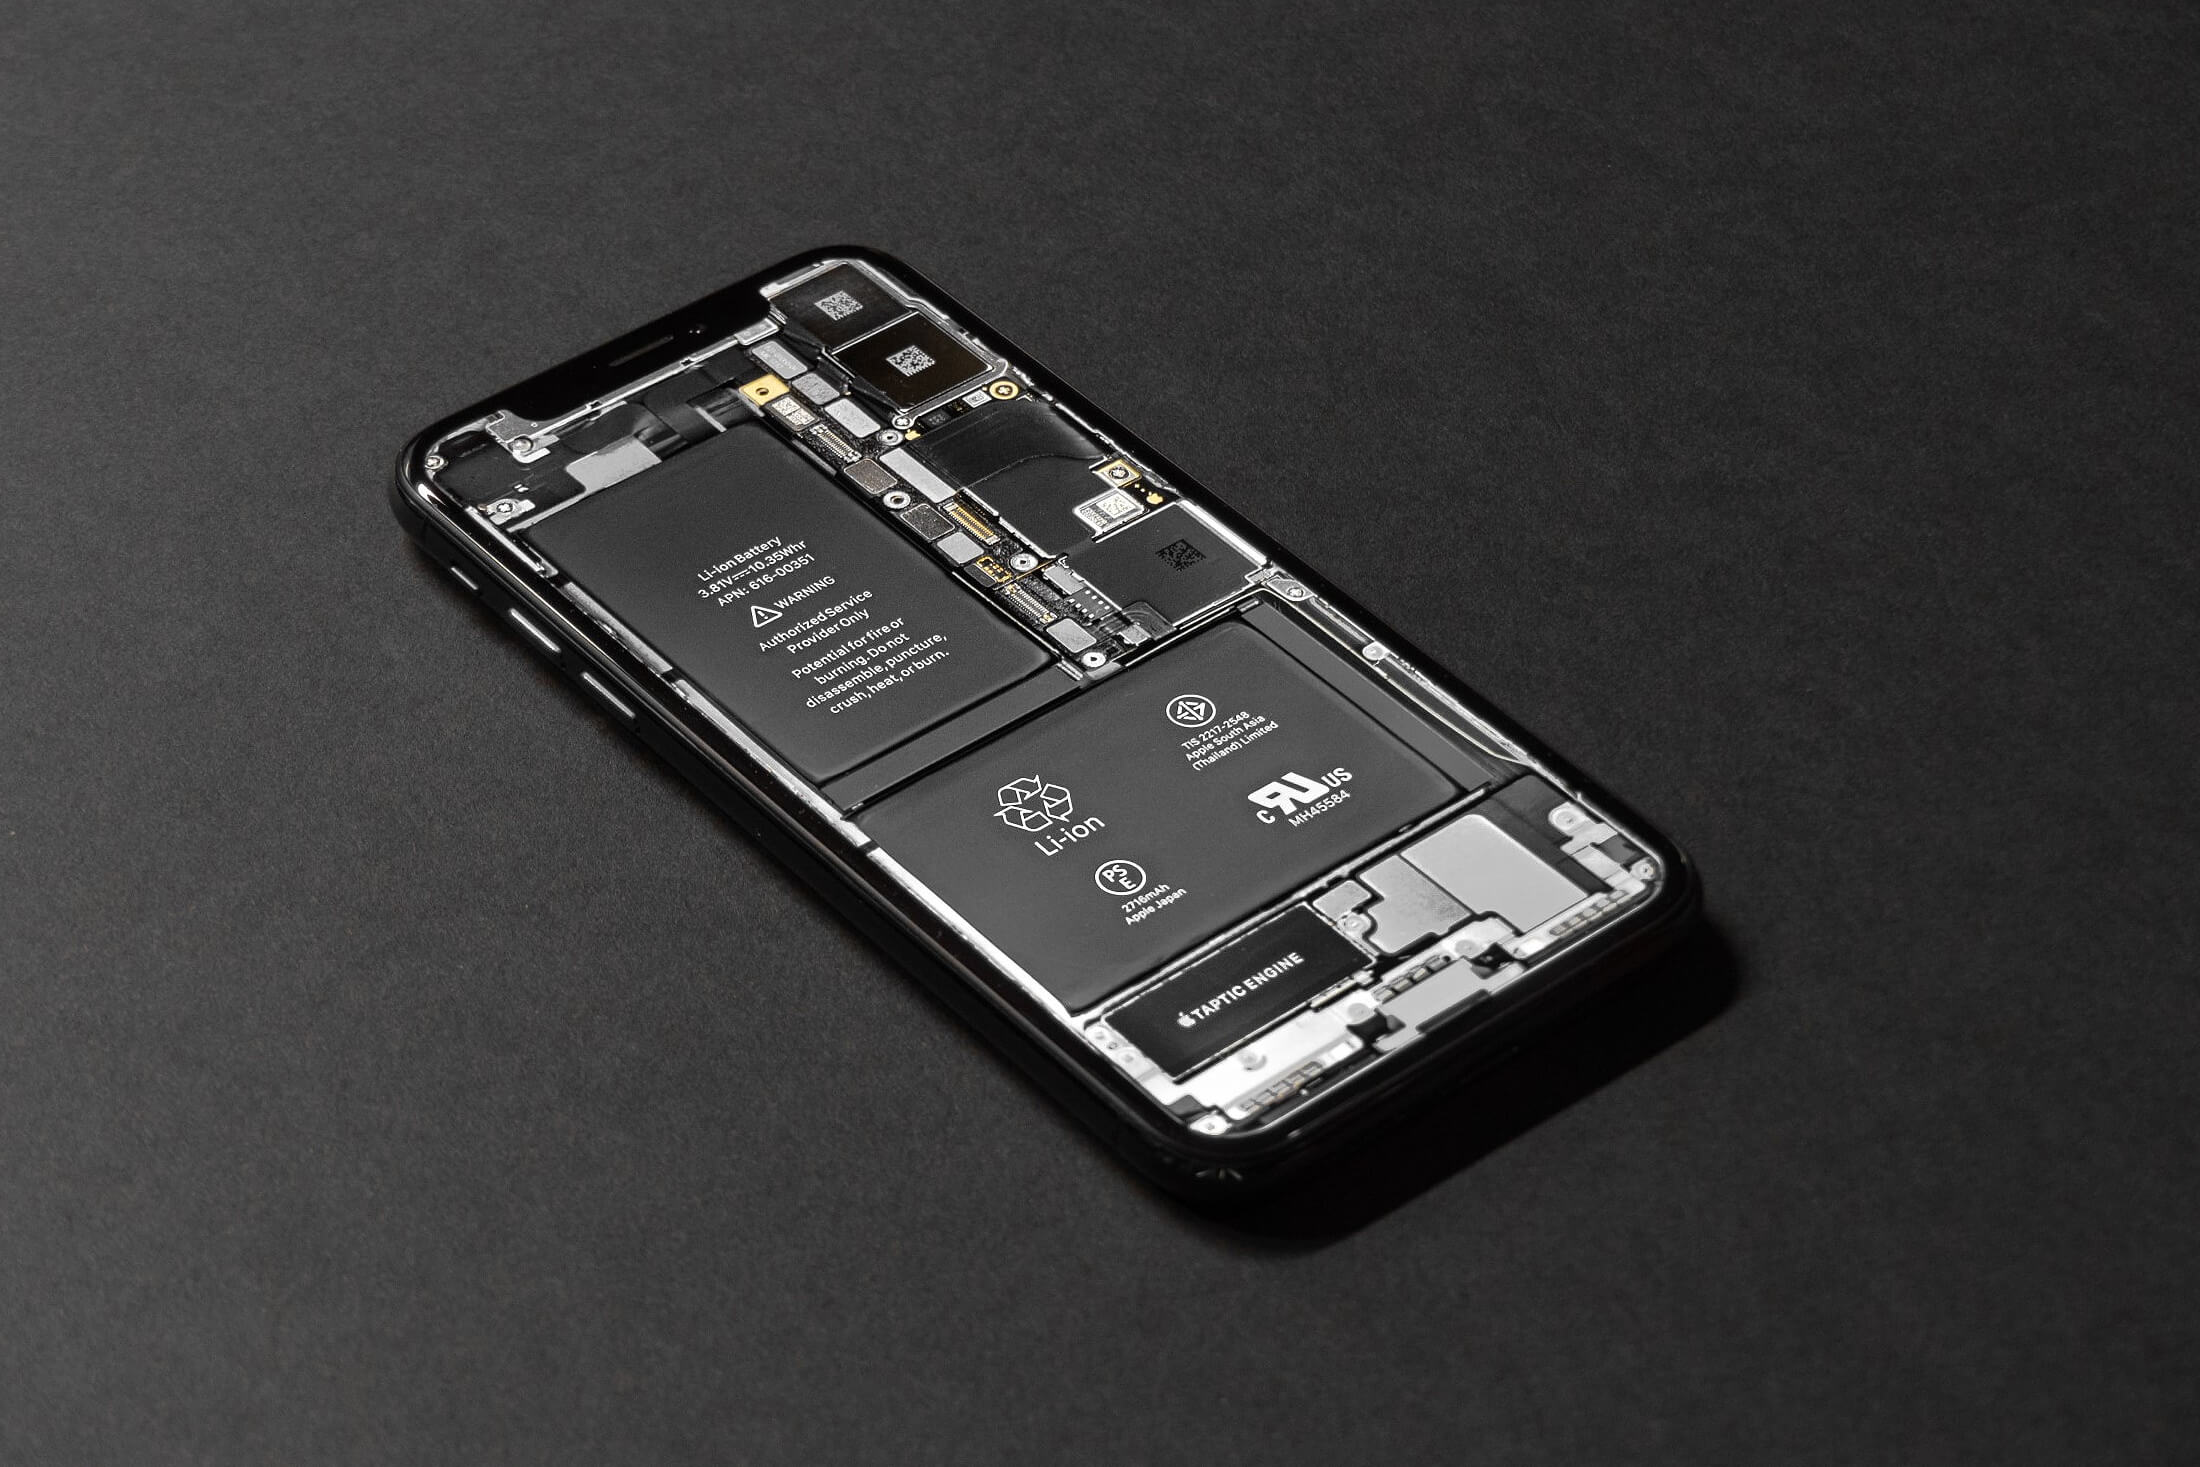 литий-ионная батарея (li-ion аккумулятор) телефона